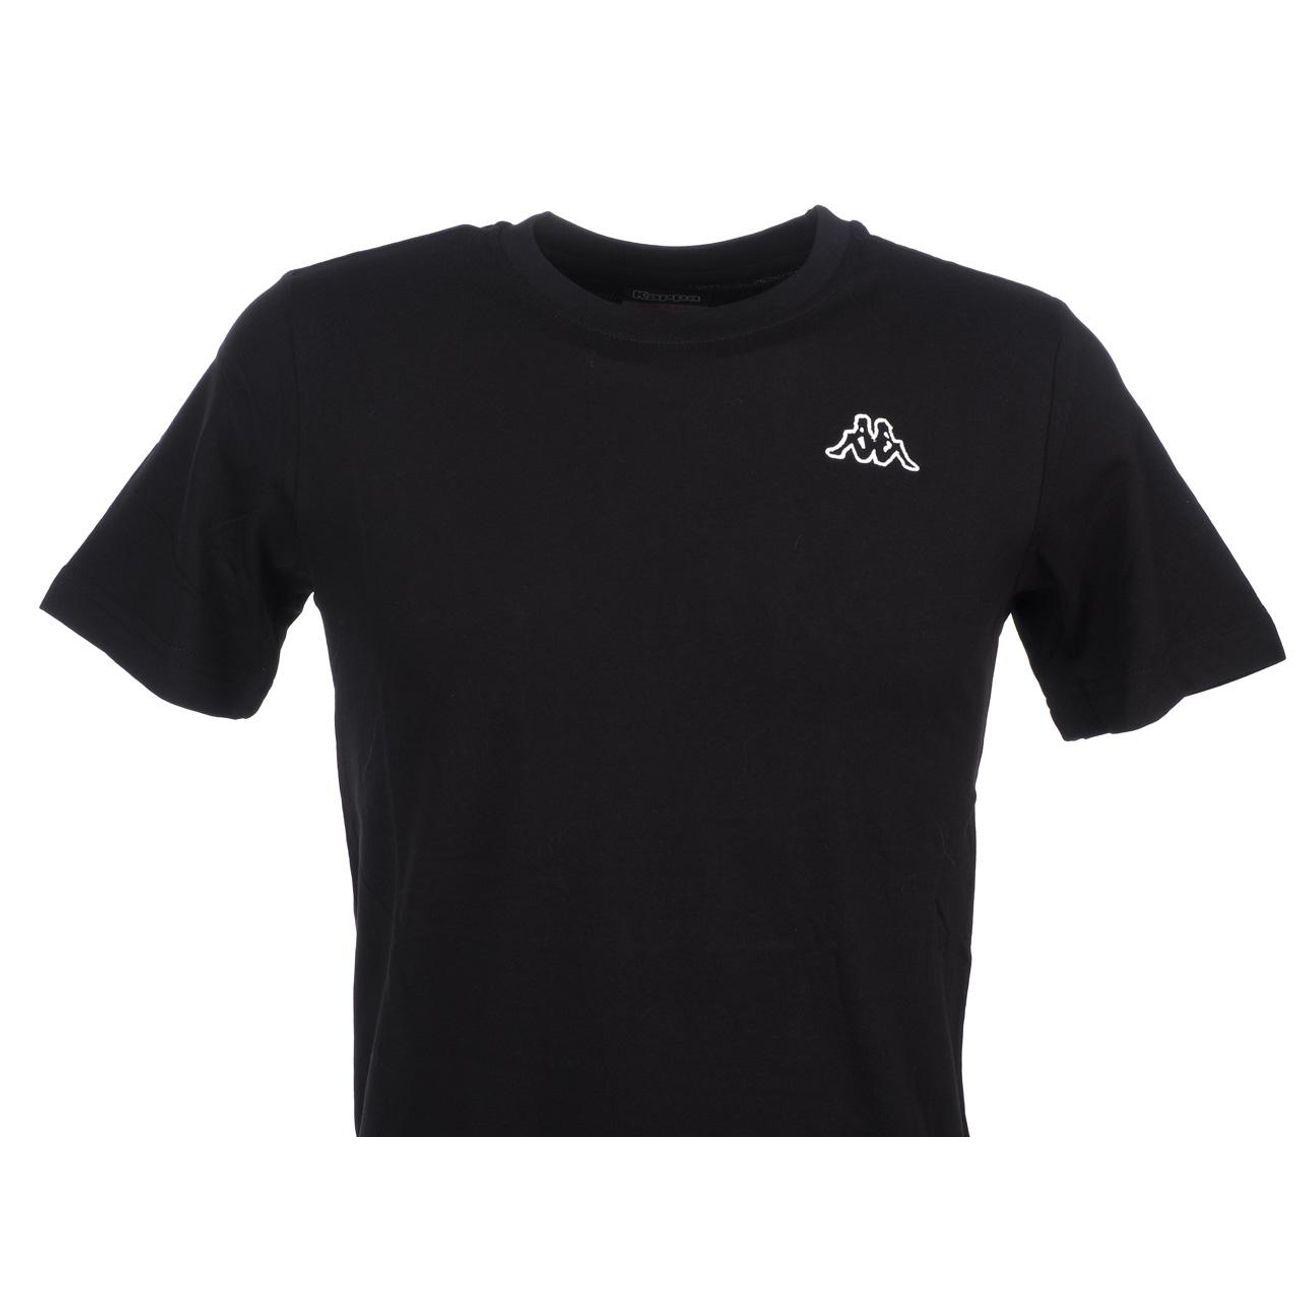 Manches ModeLifestyle Tee Cafers Shirt Homme Courtes Kappa Noir Coton 4A5j3RLq